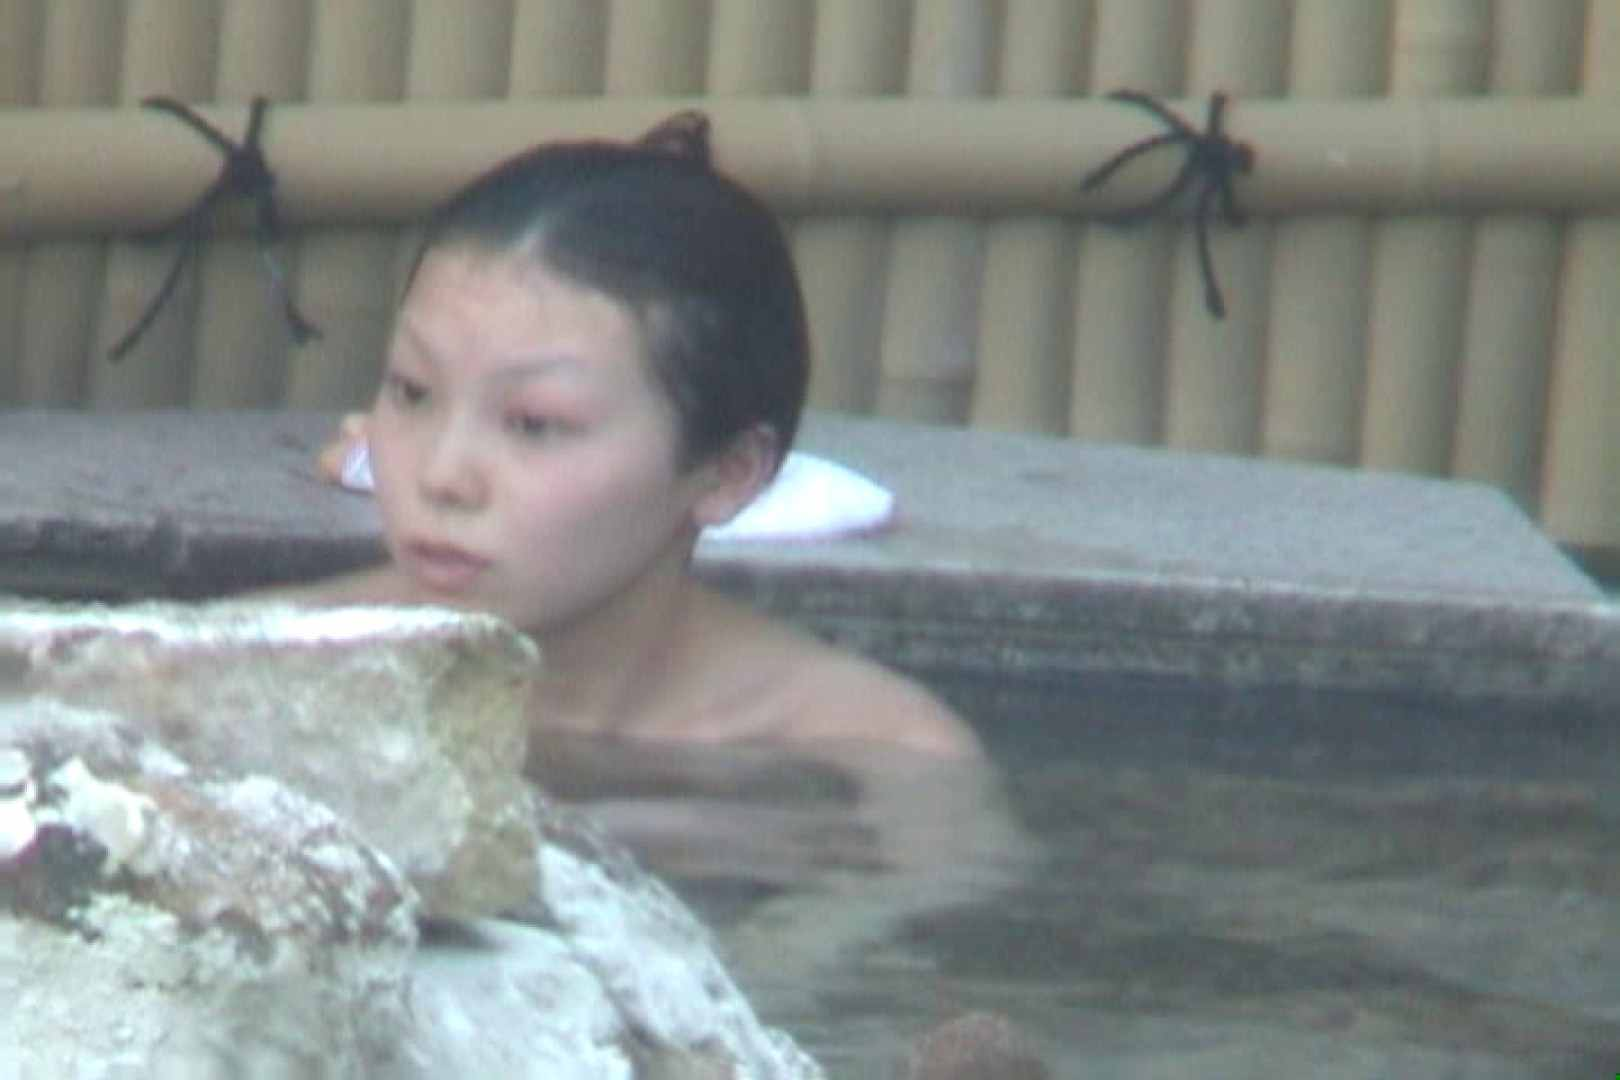 Aquaな露天風呂Vol.572 盗撮 | OLエロ画像  67PICs 34